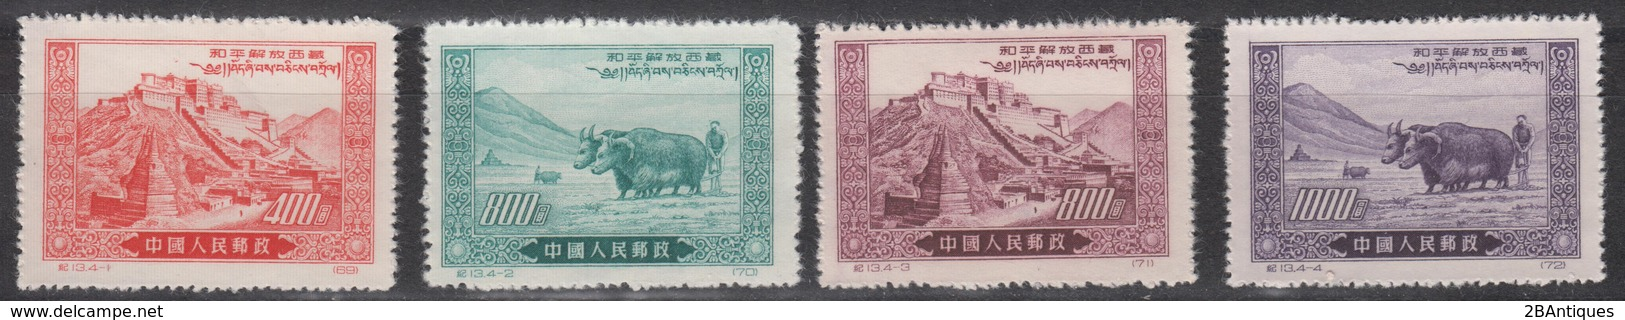 PR CHINA 1952 - Peaceful Liberation Of Tibet MNH Complete Set - 1949 - ... Repubblica Popolare